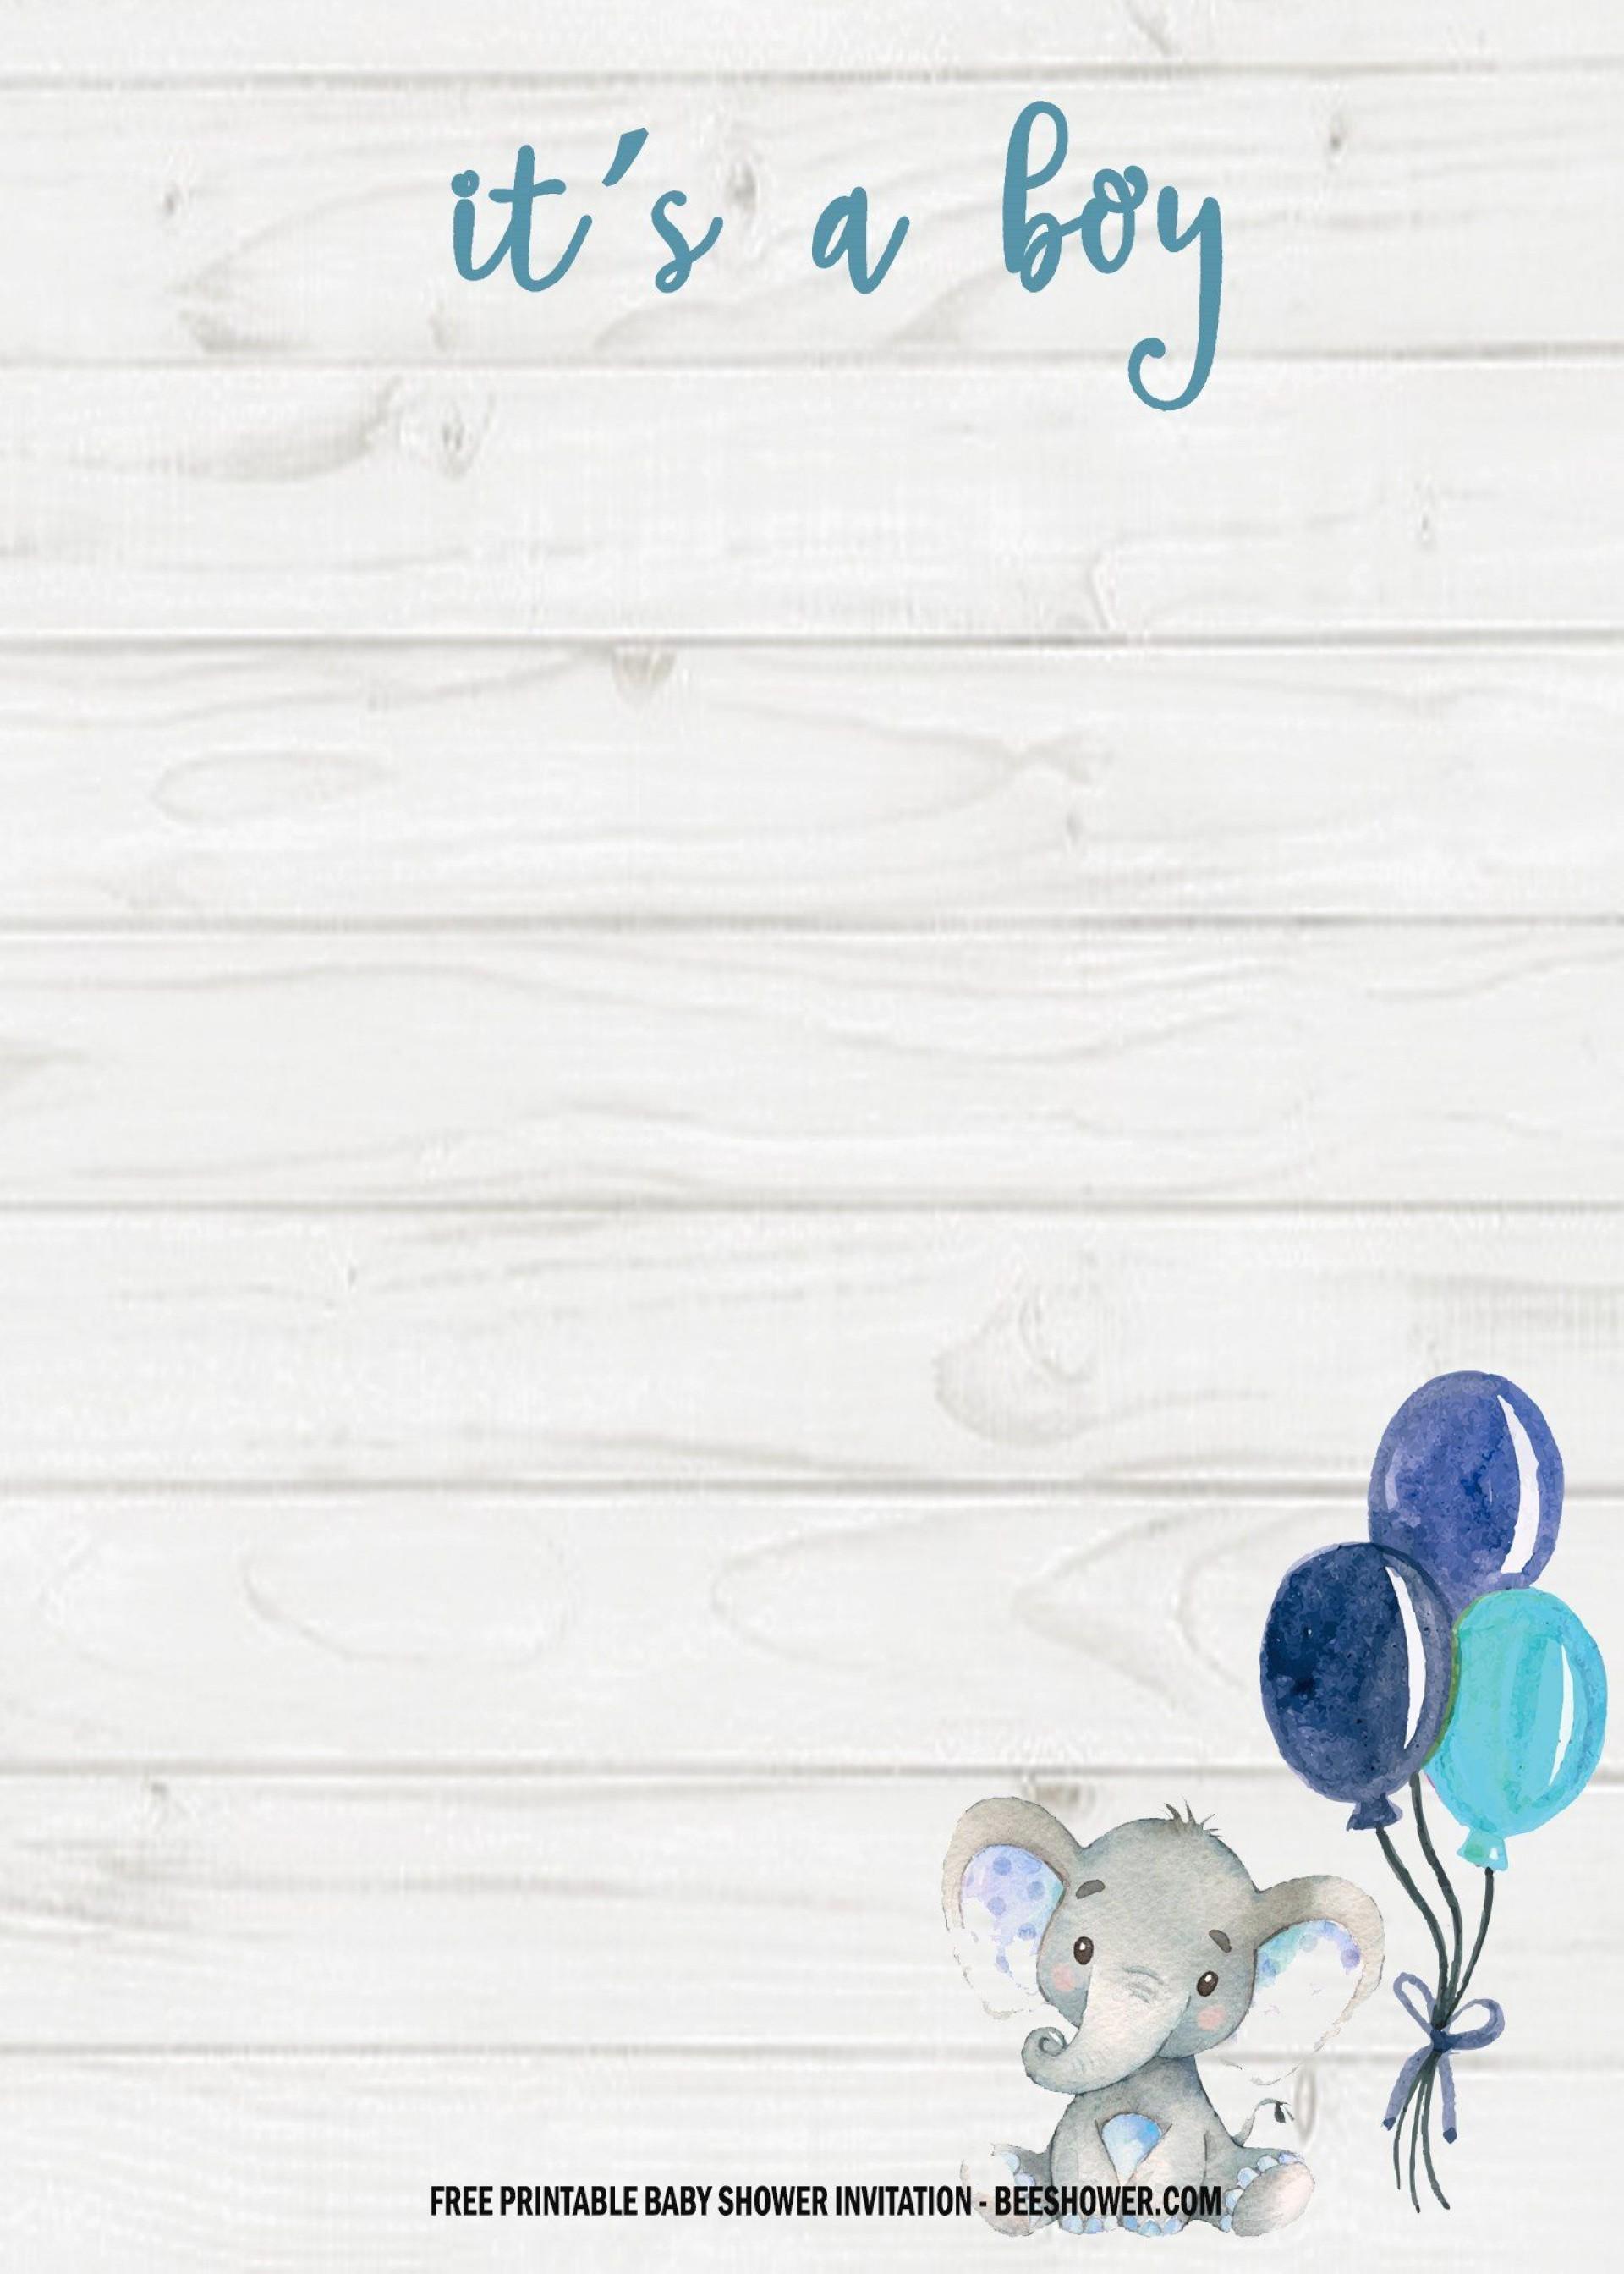 006 Marvelou Elephant Baby Shower Invitation Template Example  Templates Free Pdf Boy1920